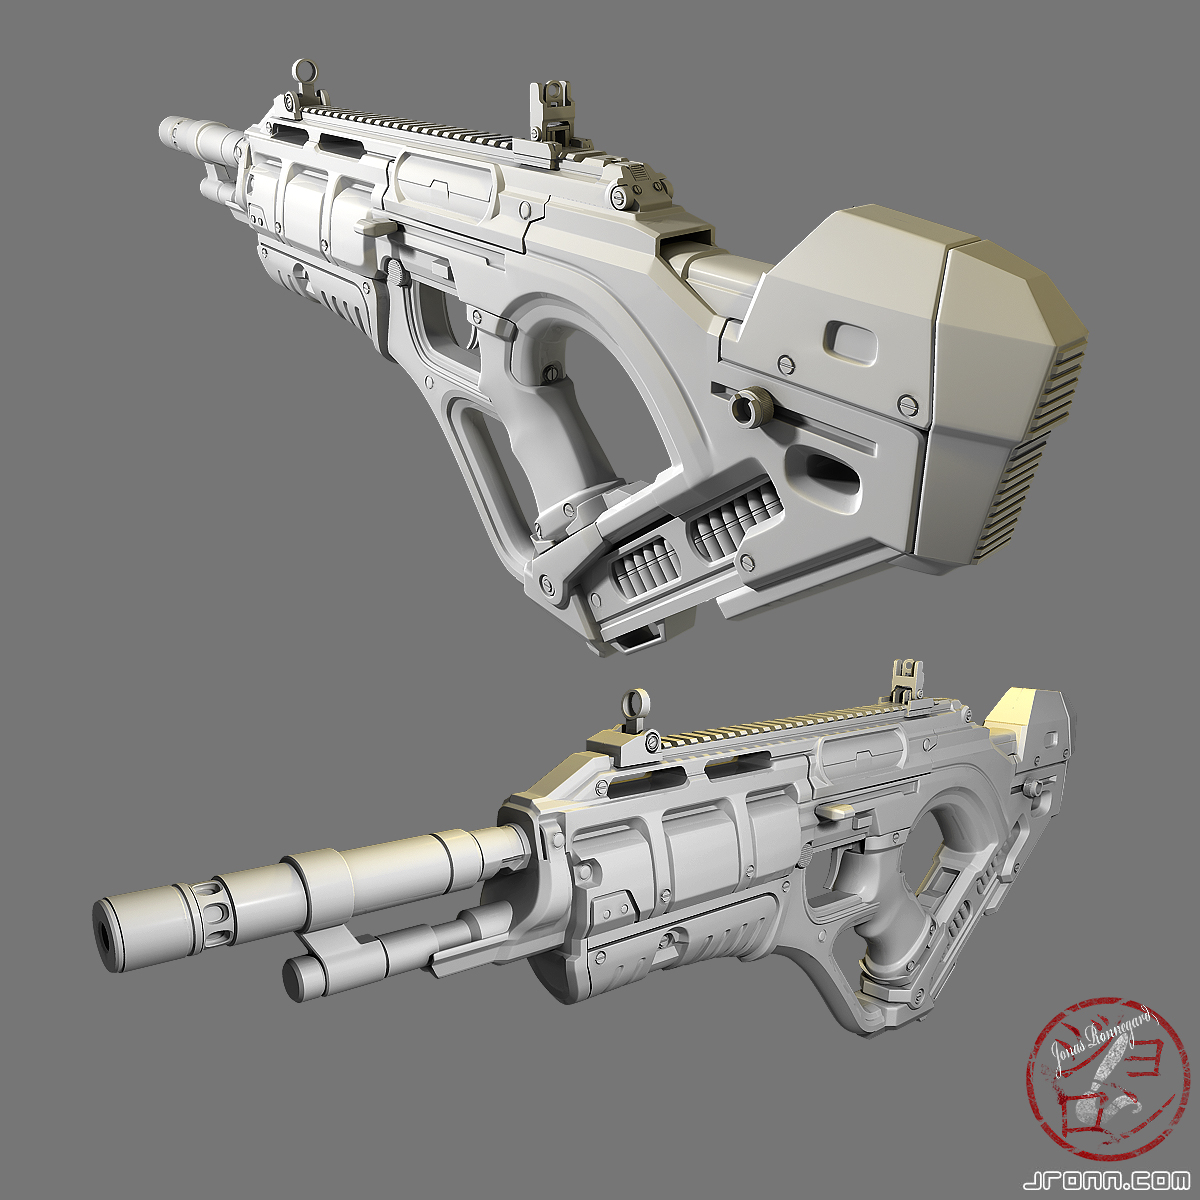 Futuristic weapon design by Jonasrjp